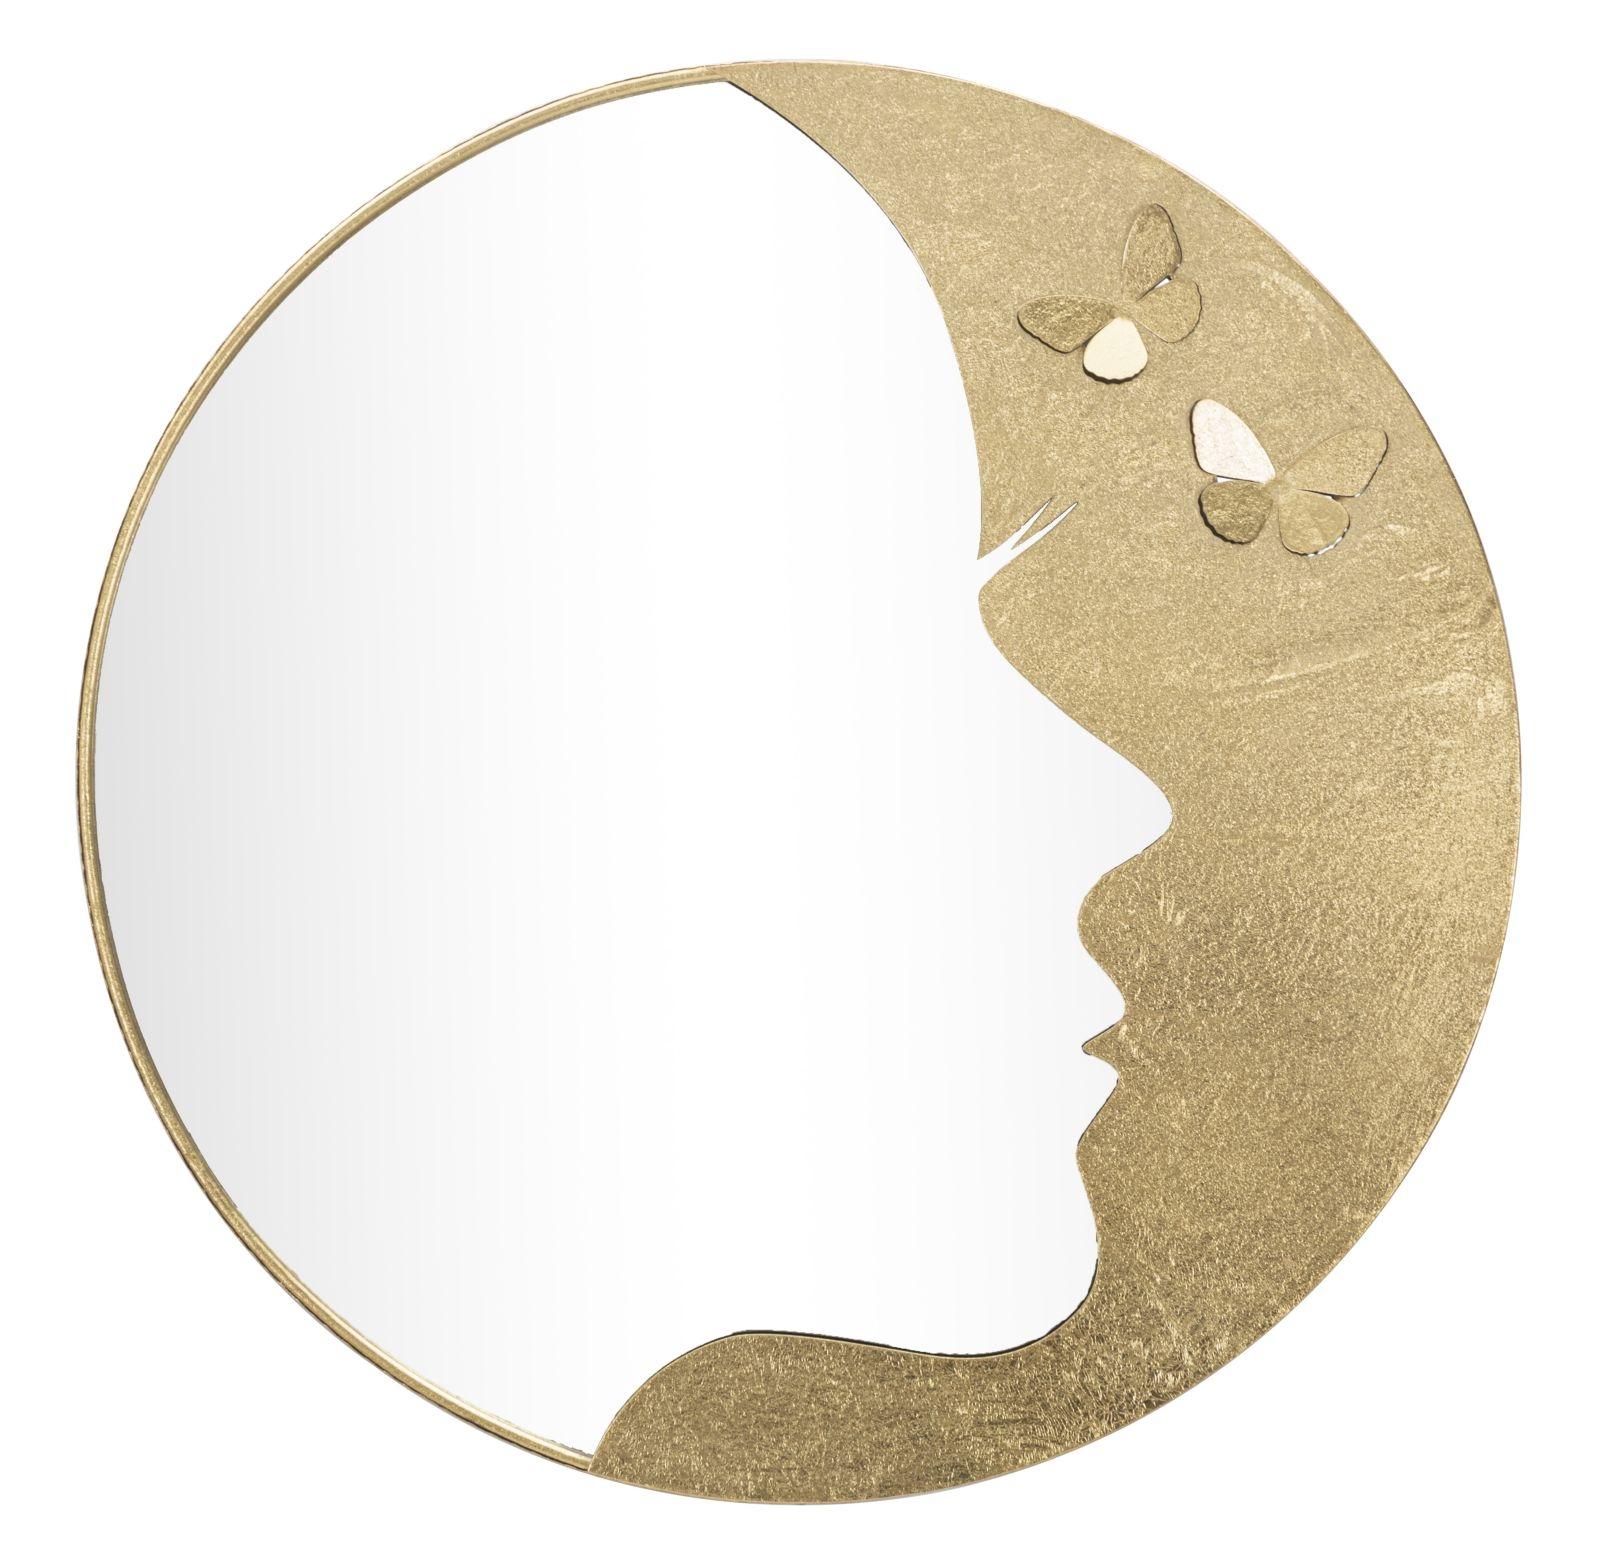 Oglinda decorativa cu rama metalica Glam Lady Luxy Auriu, Ø80 cm